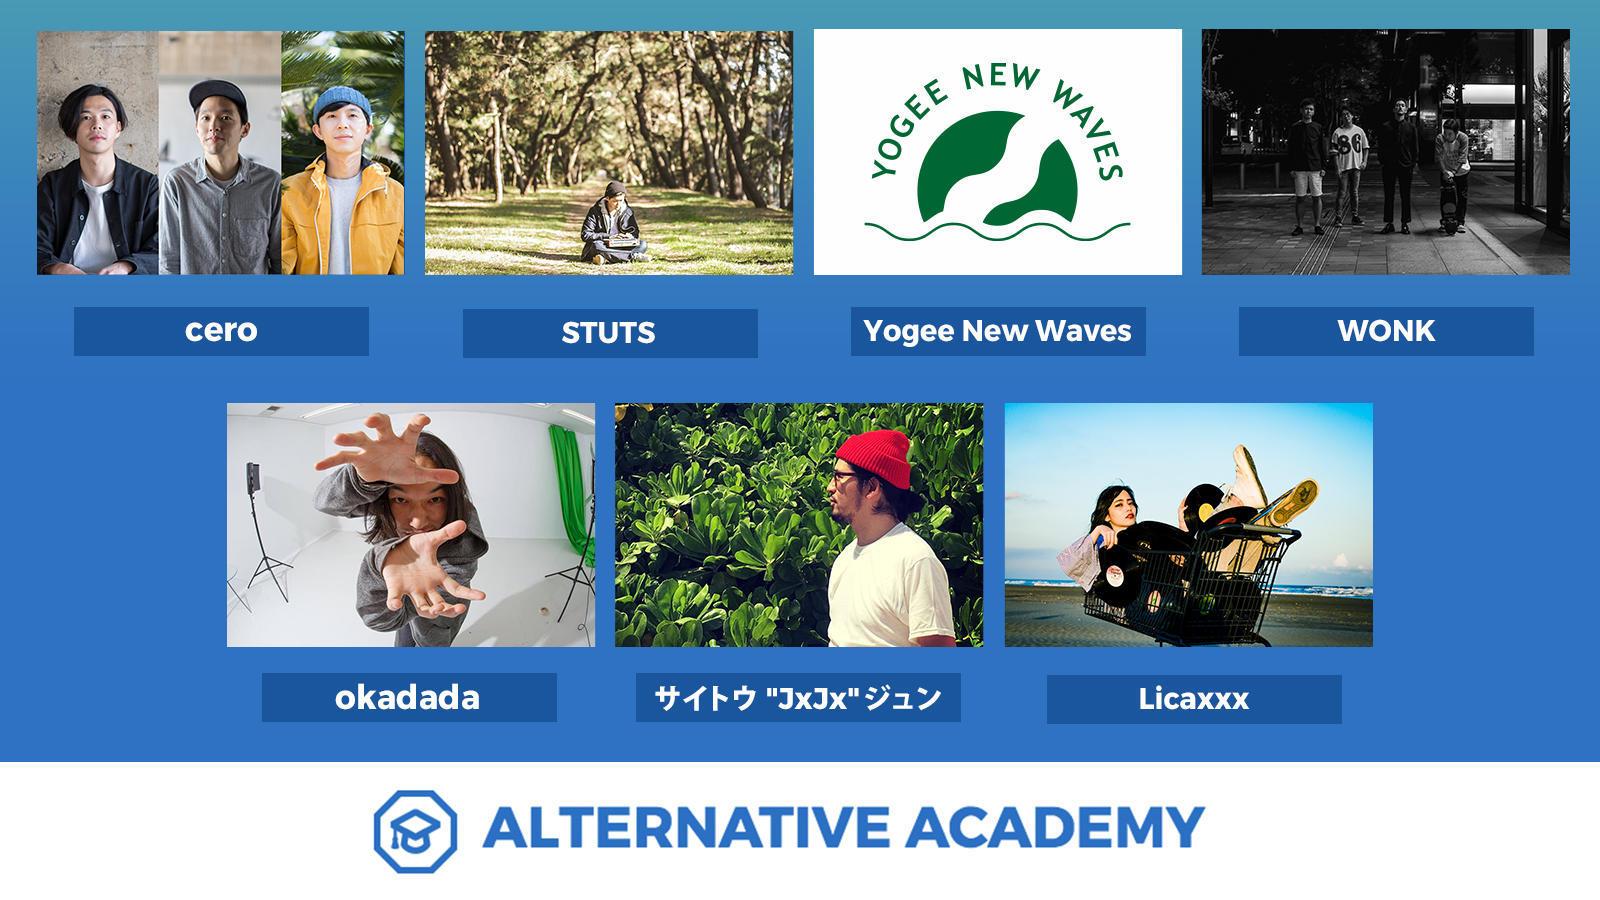 cero / Yogee New Waves / WONK / okadada / サイトウ